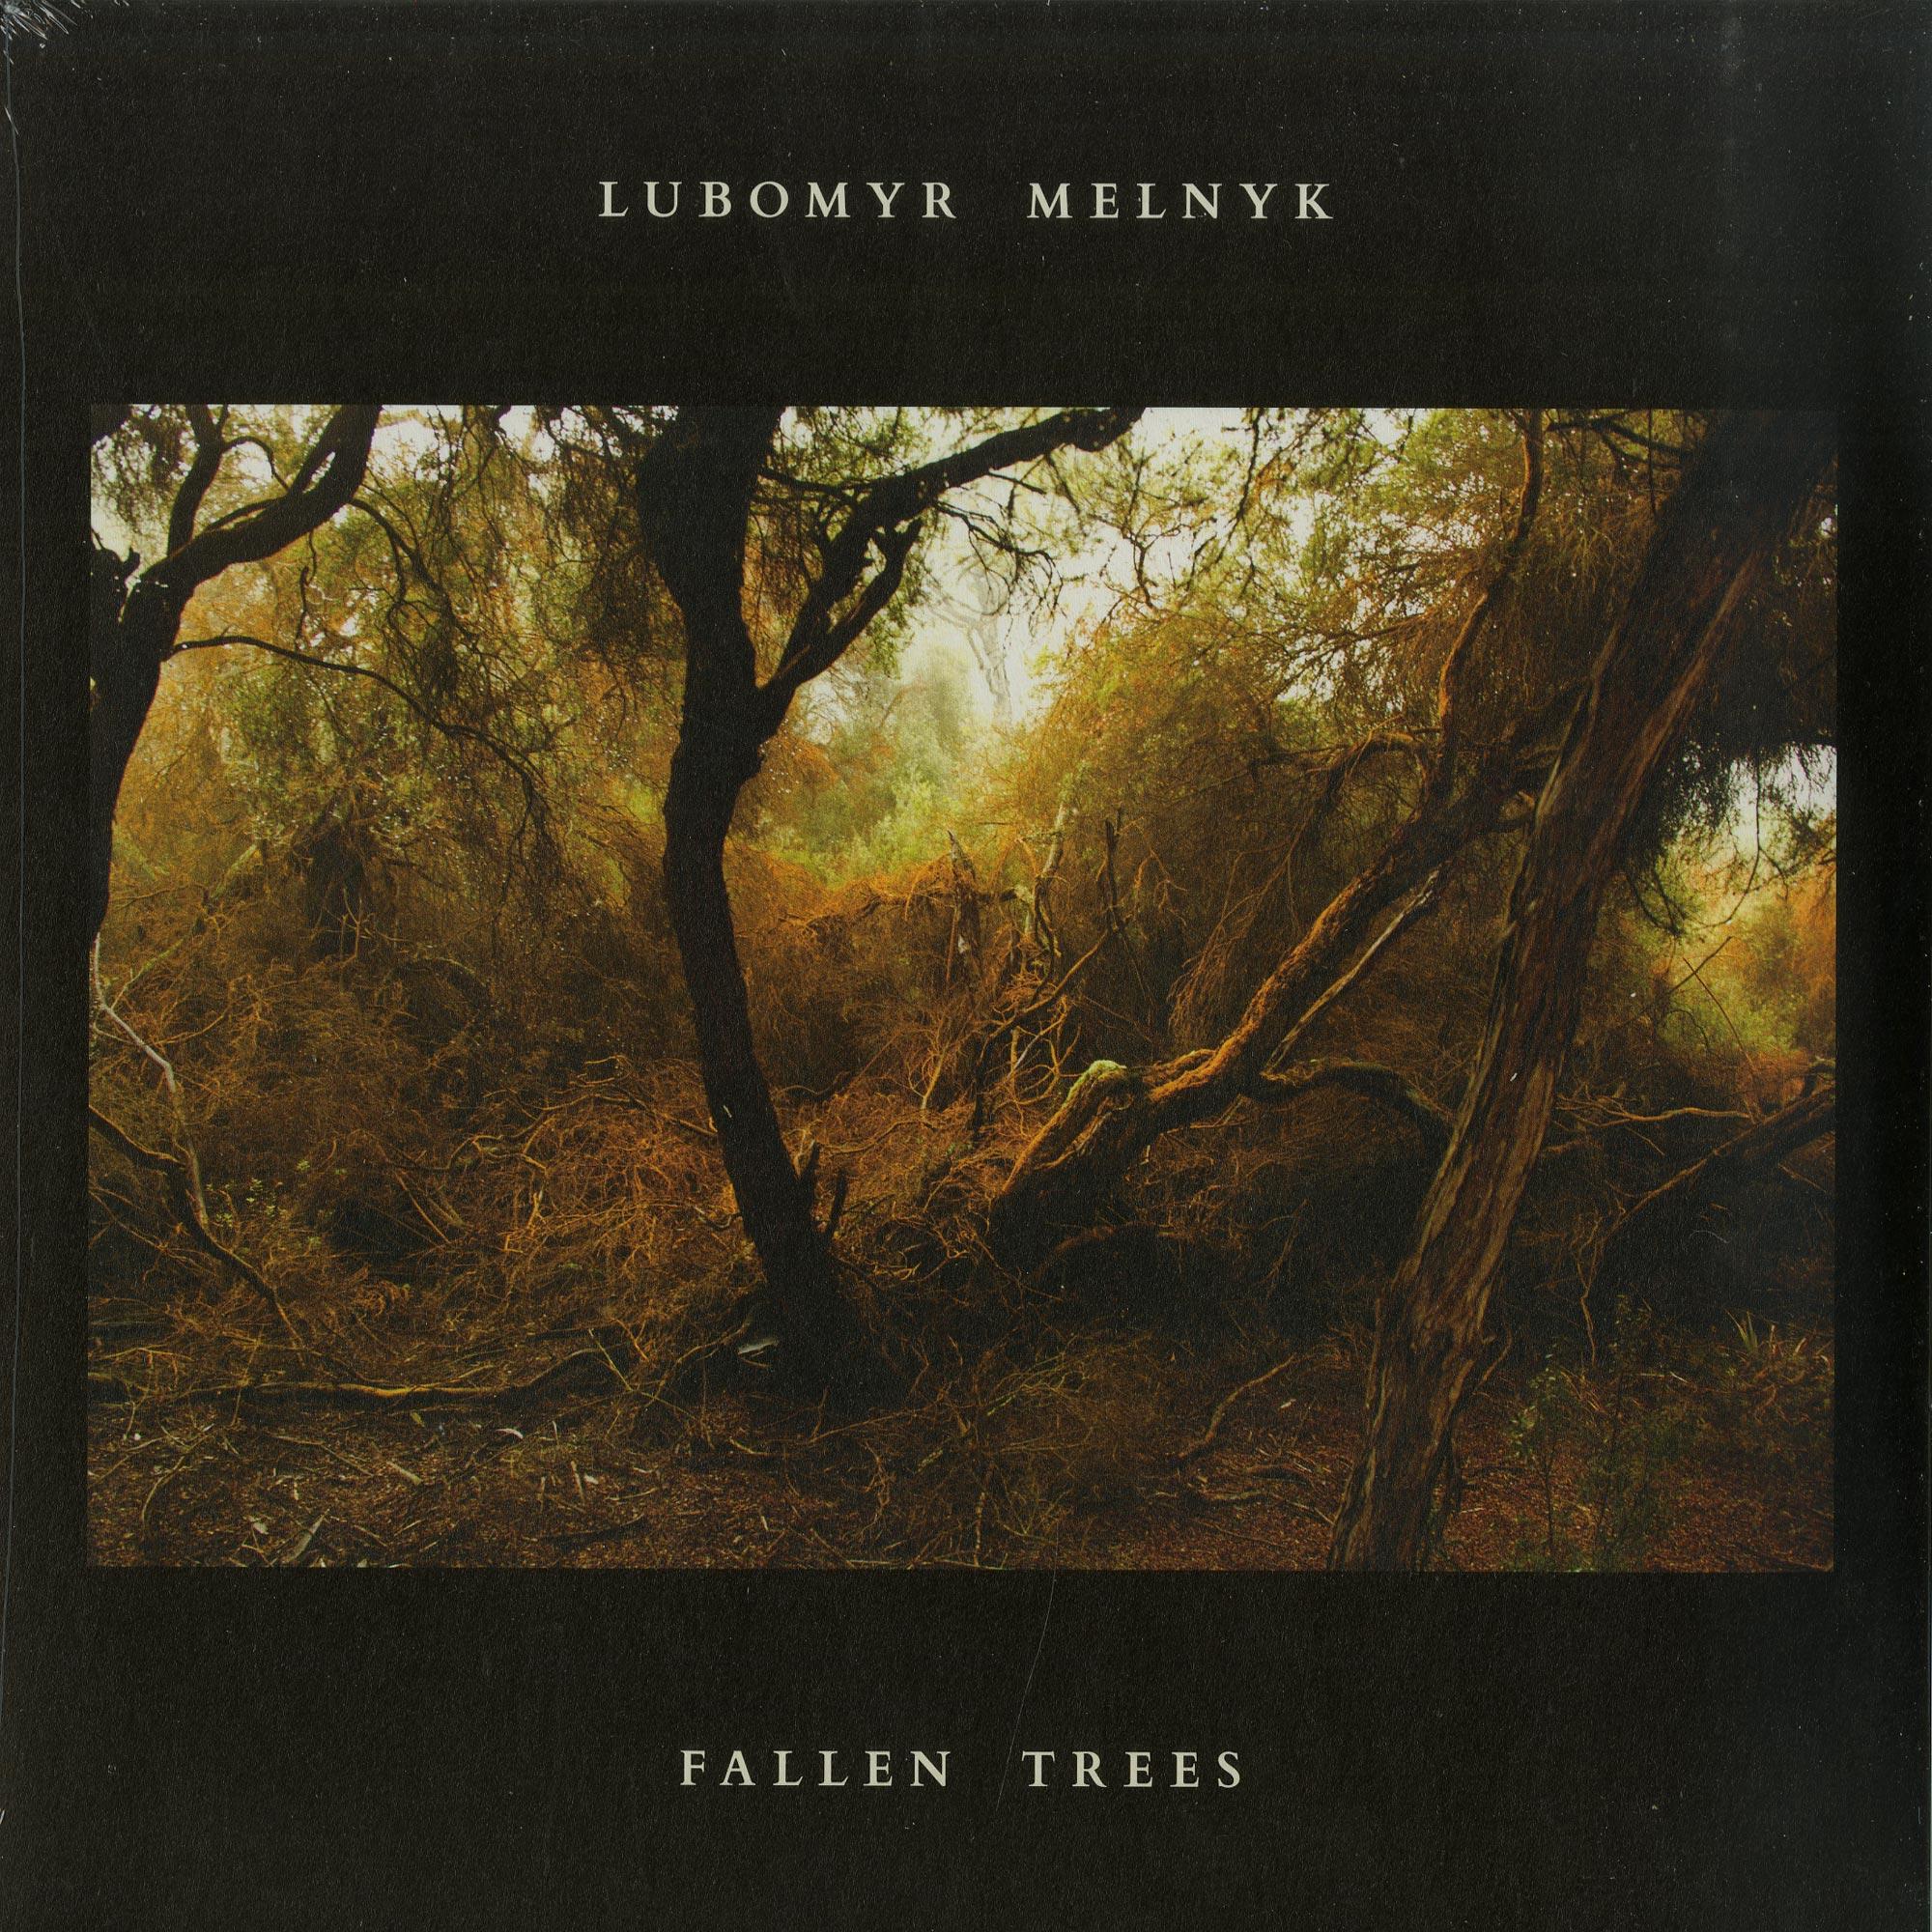 Lubomyr Melnyk - FALLEN TREES